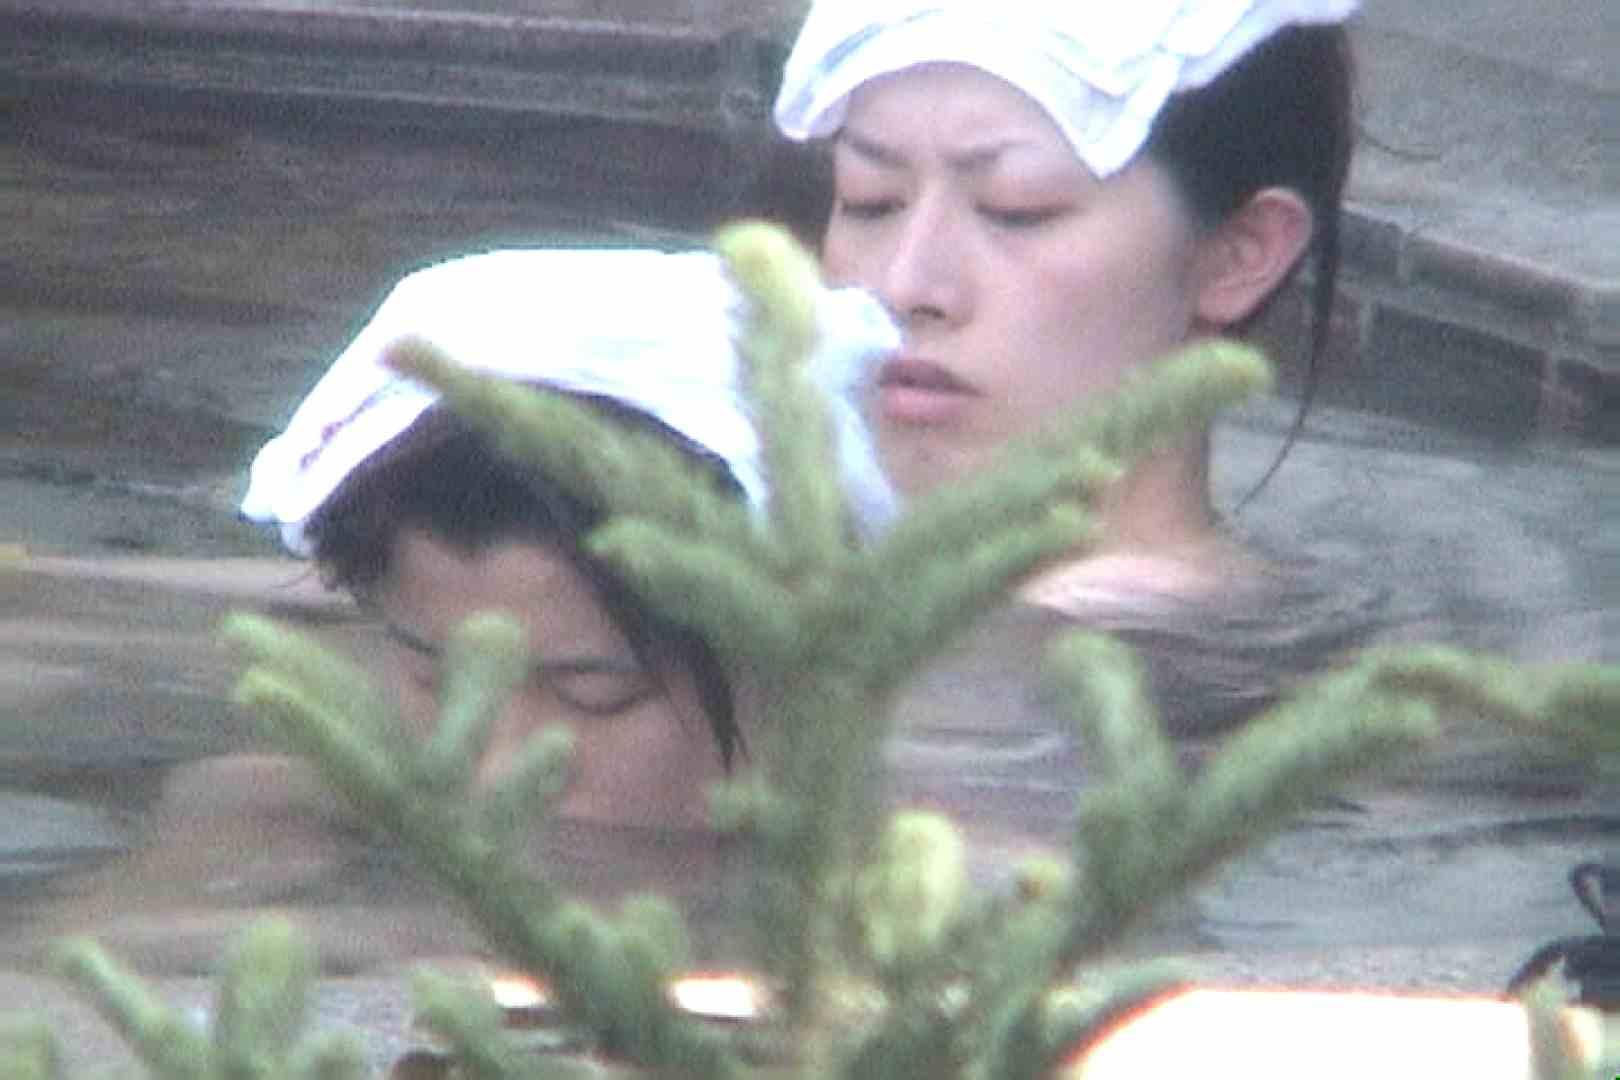 Aquaな露天風呂Vol.80【VIP限定】 盗撮 | HなOL  66pic 53